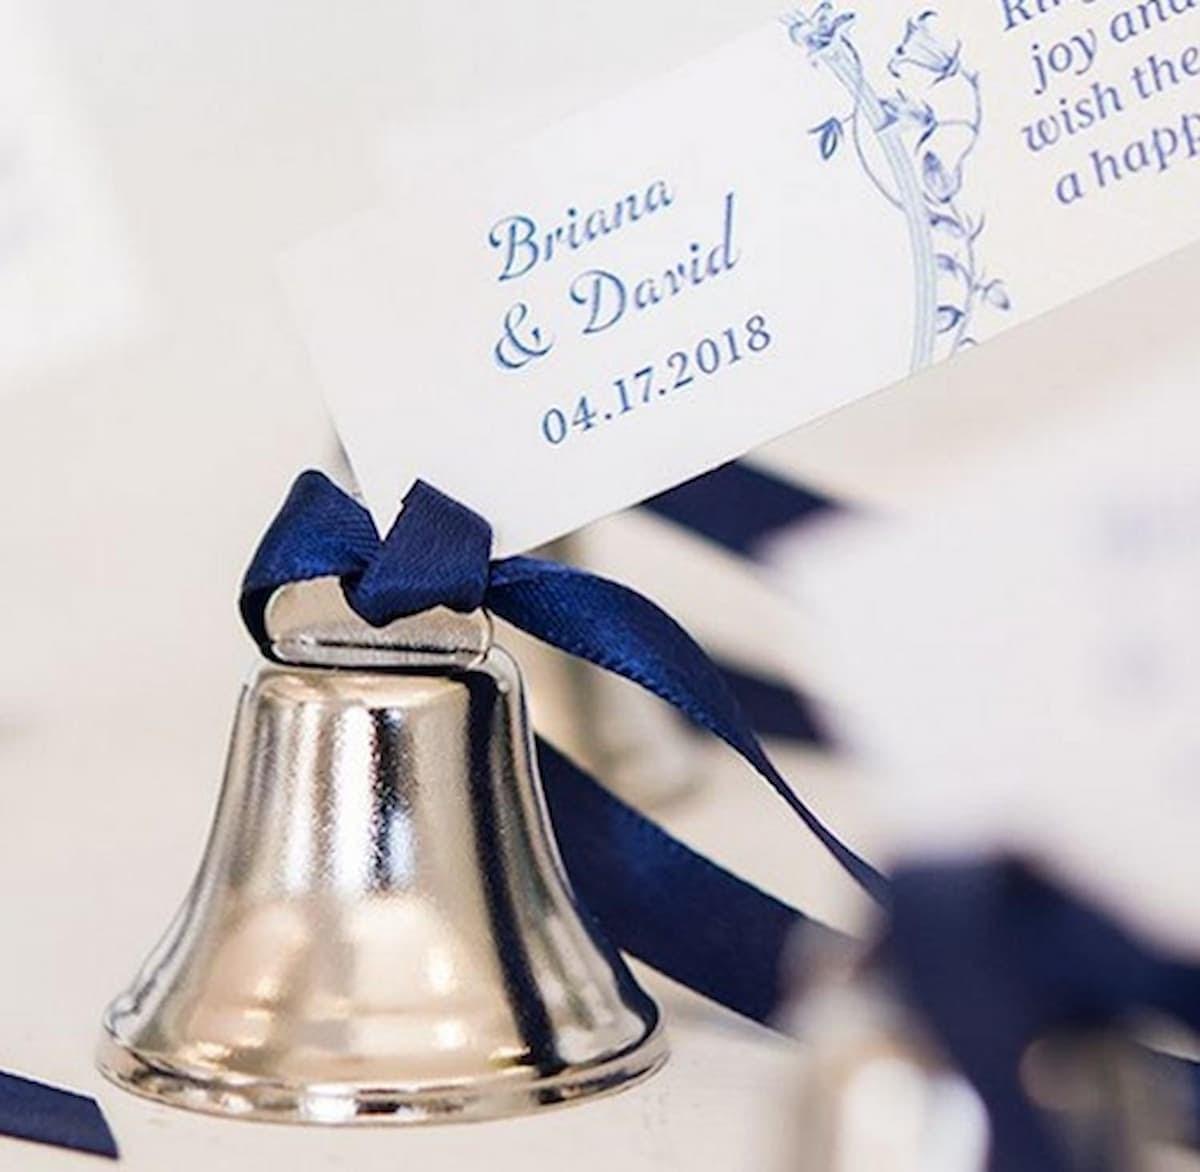 Silver jingle kissing bell for Christmas themed wedding